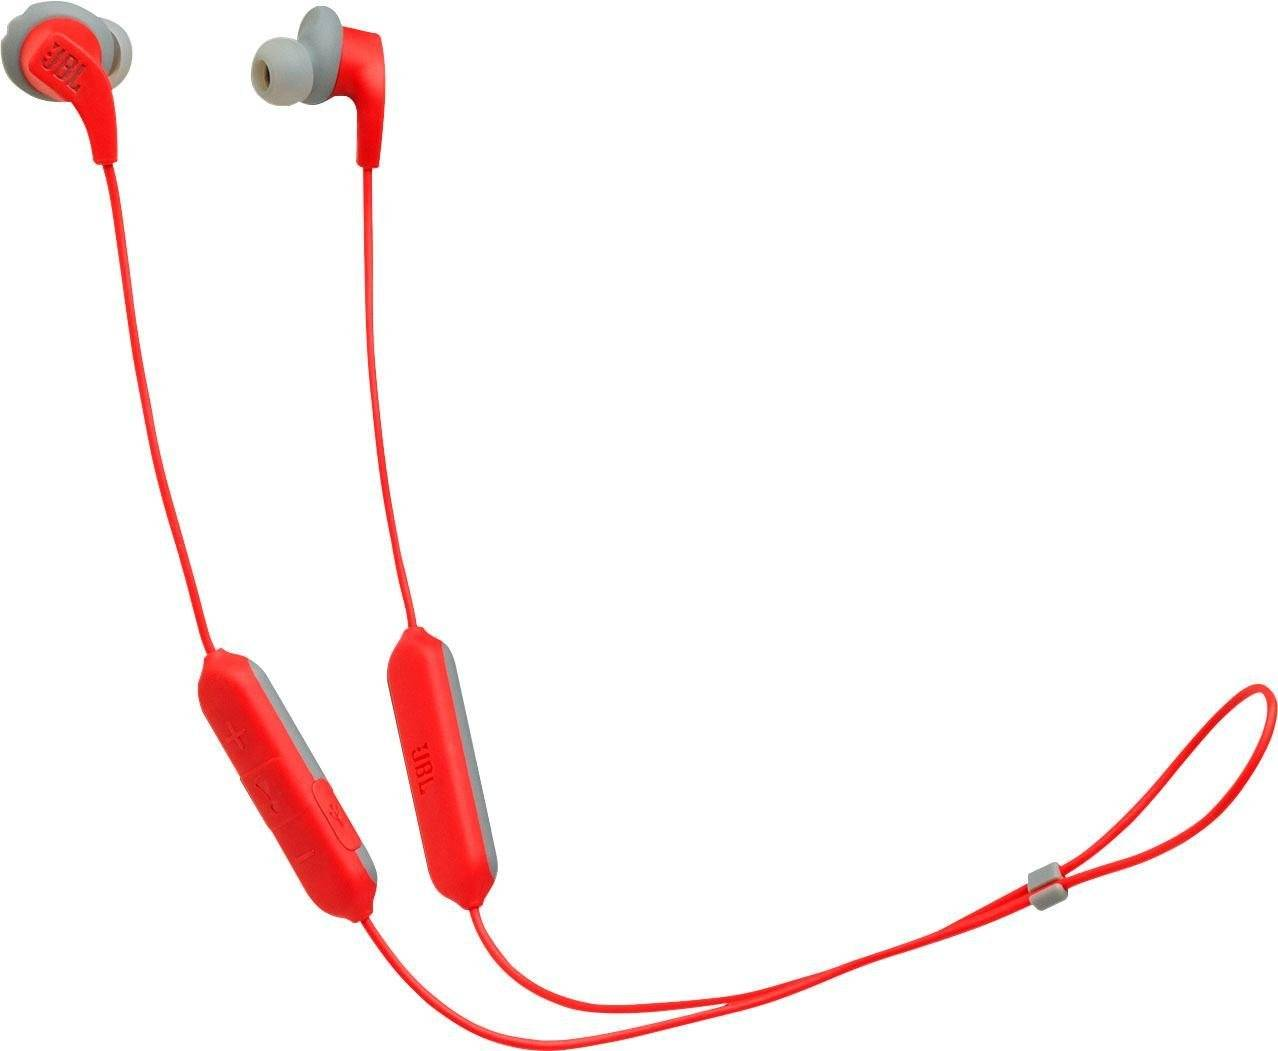 JBL »Endurance Run BT« wireless In-Ear-Kopfhörer (Bluetooth), rot